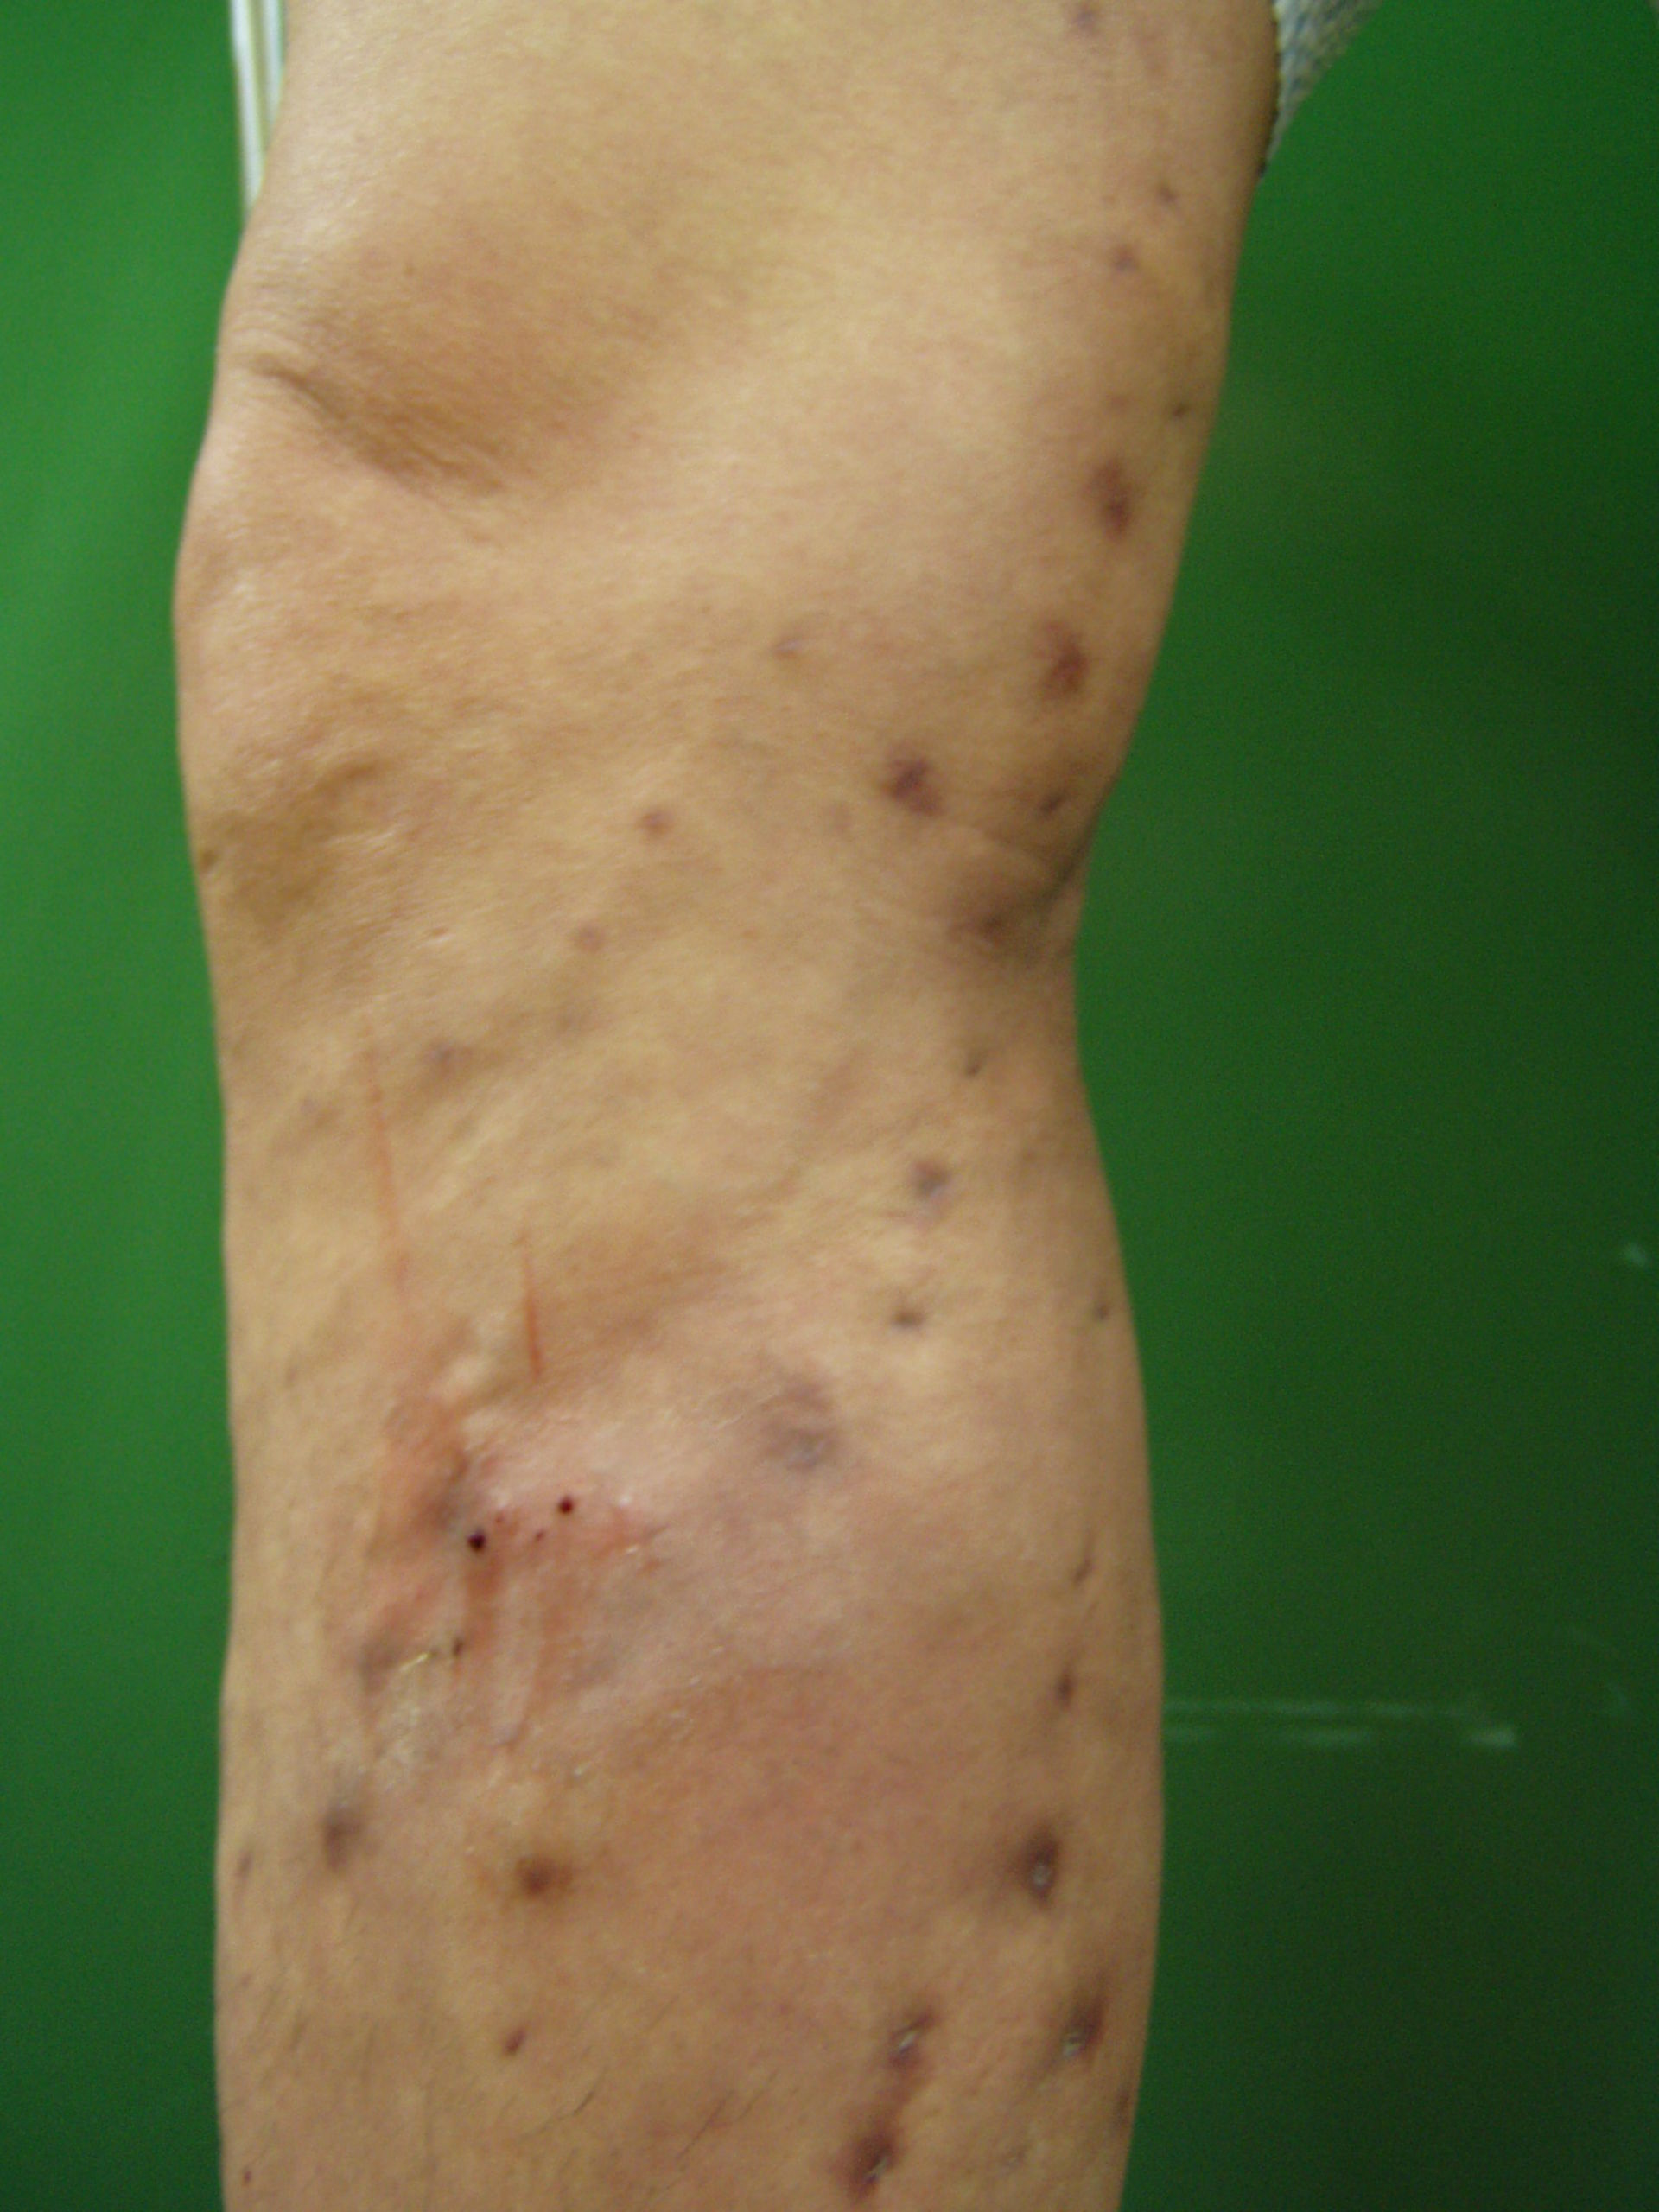 Vene varicose Kang.t.h 56 / m postop 1 mese. Cryostripping di GSV e flebectomia con Varady Hook.